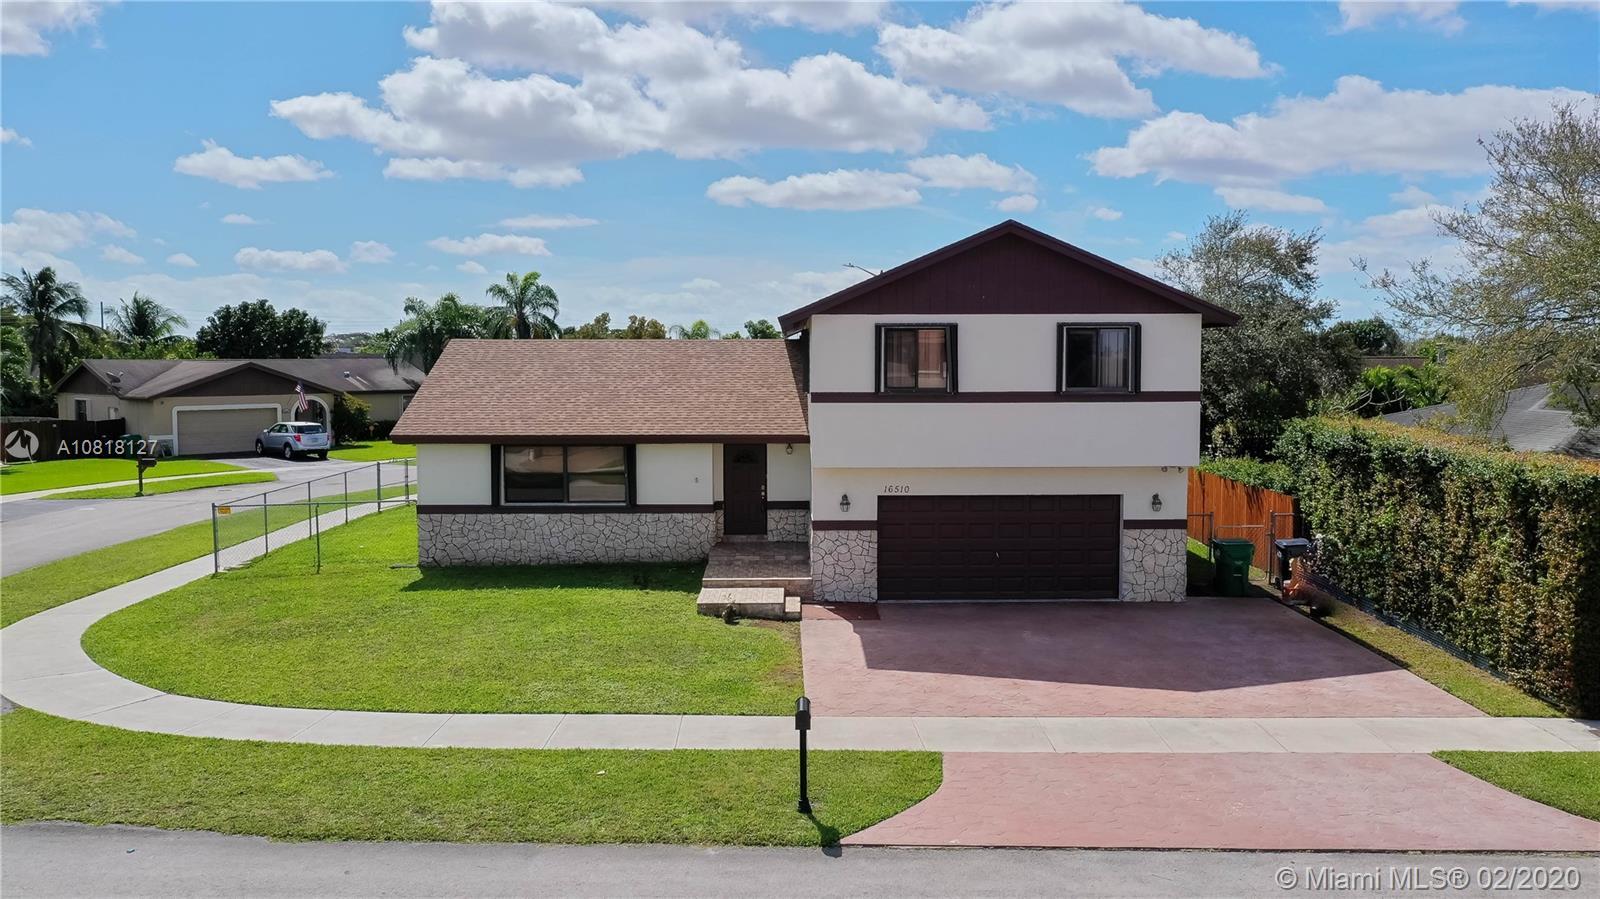 16510 SW 298 Ter, Homestead, FL 33033 - Homestead, FL real estate listing